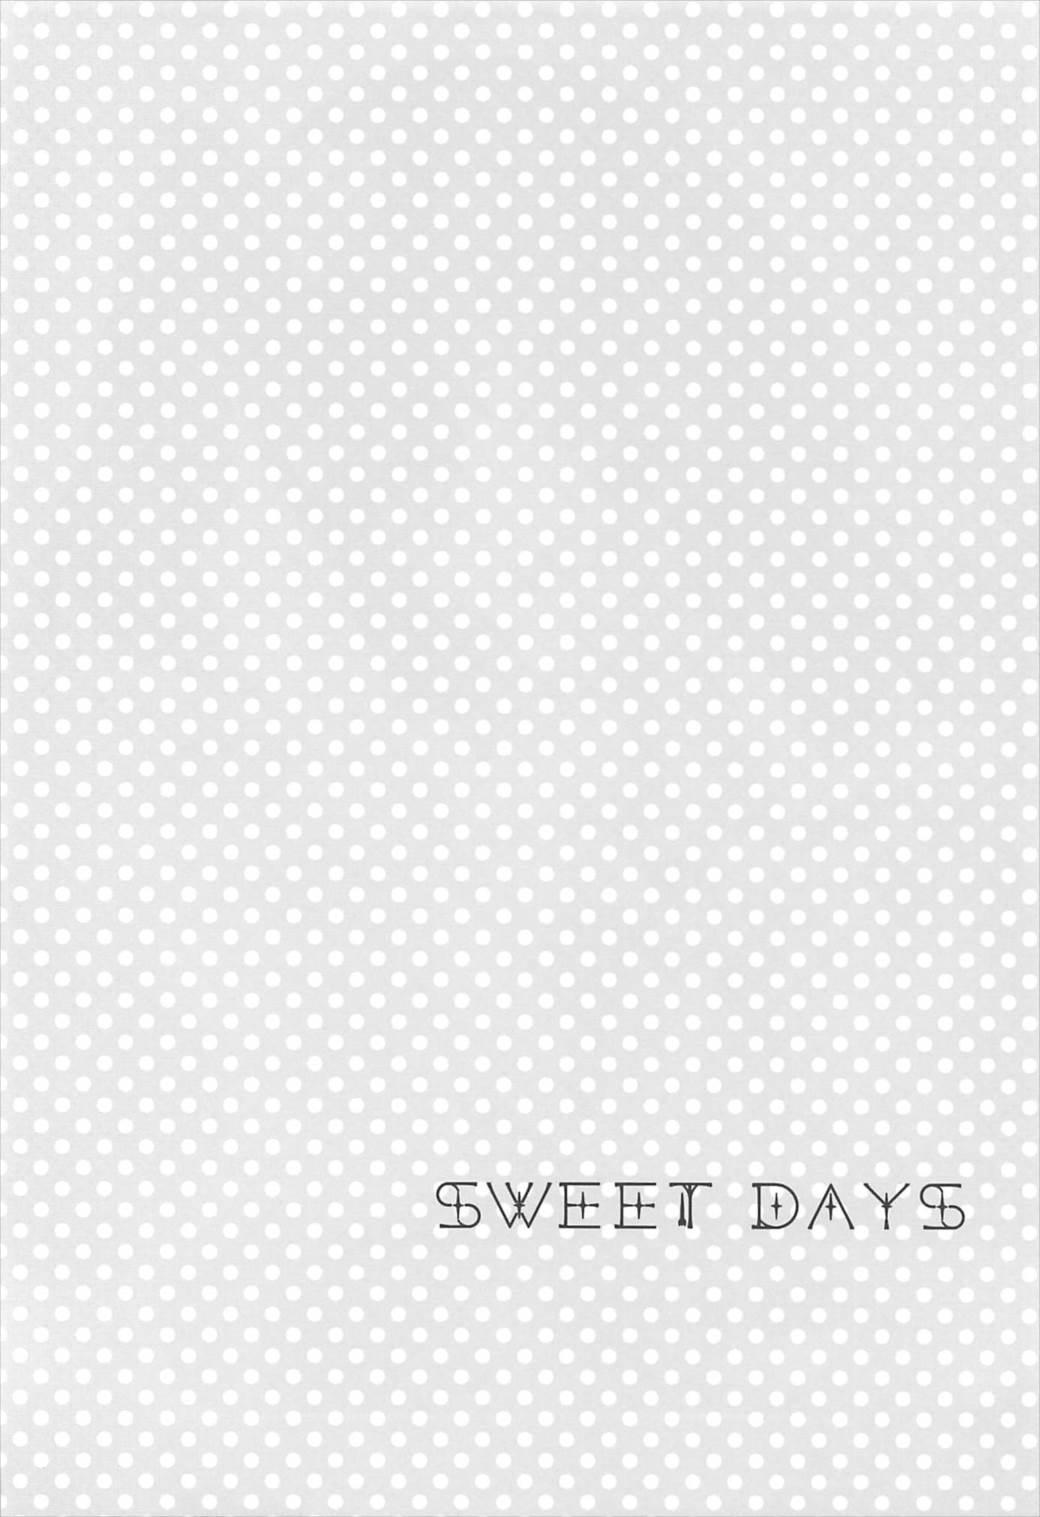 SWEET DAYS 2